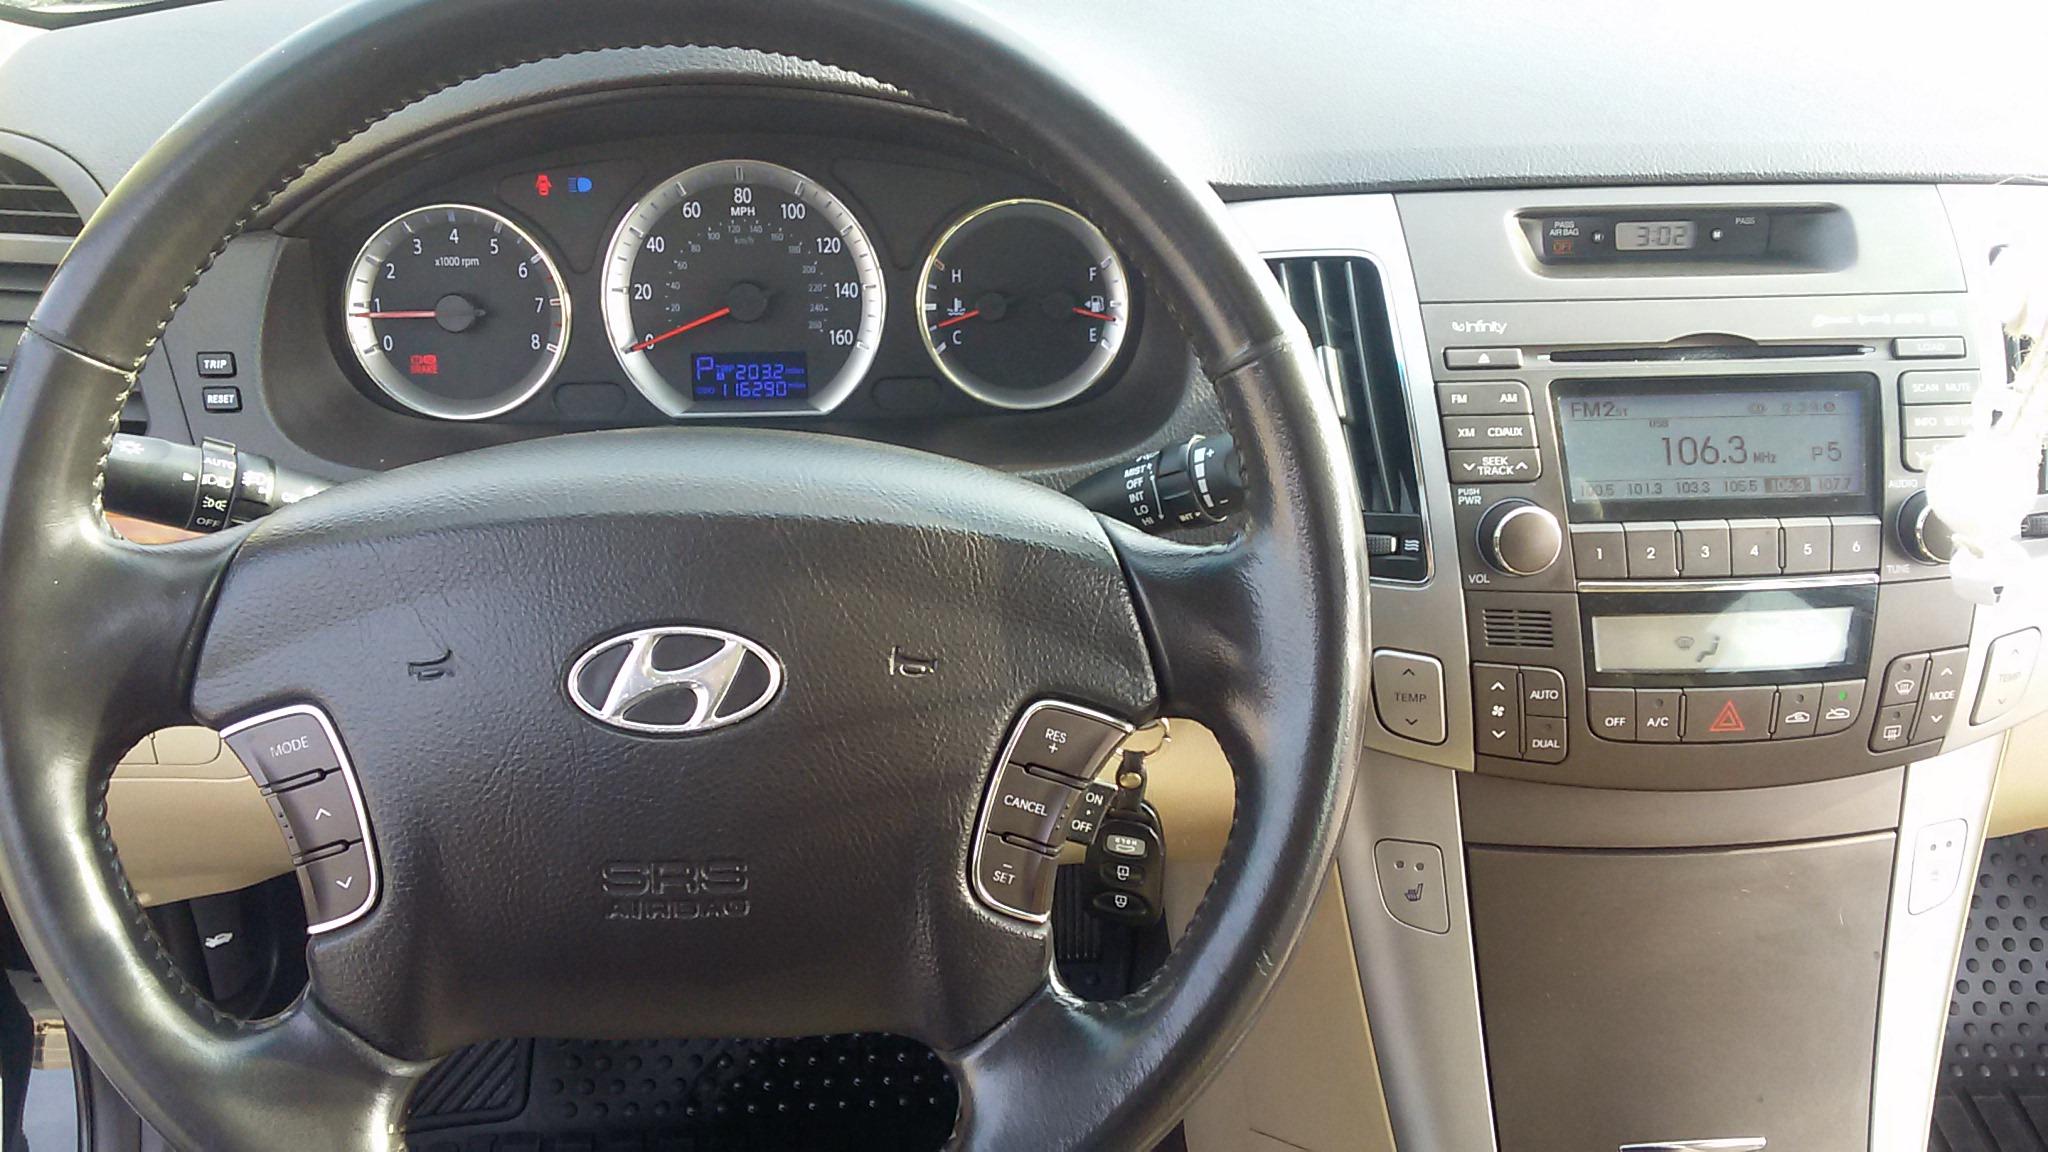 Hyundai Sonata 2.4(lt) 2008 Подержанный  $17600